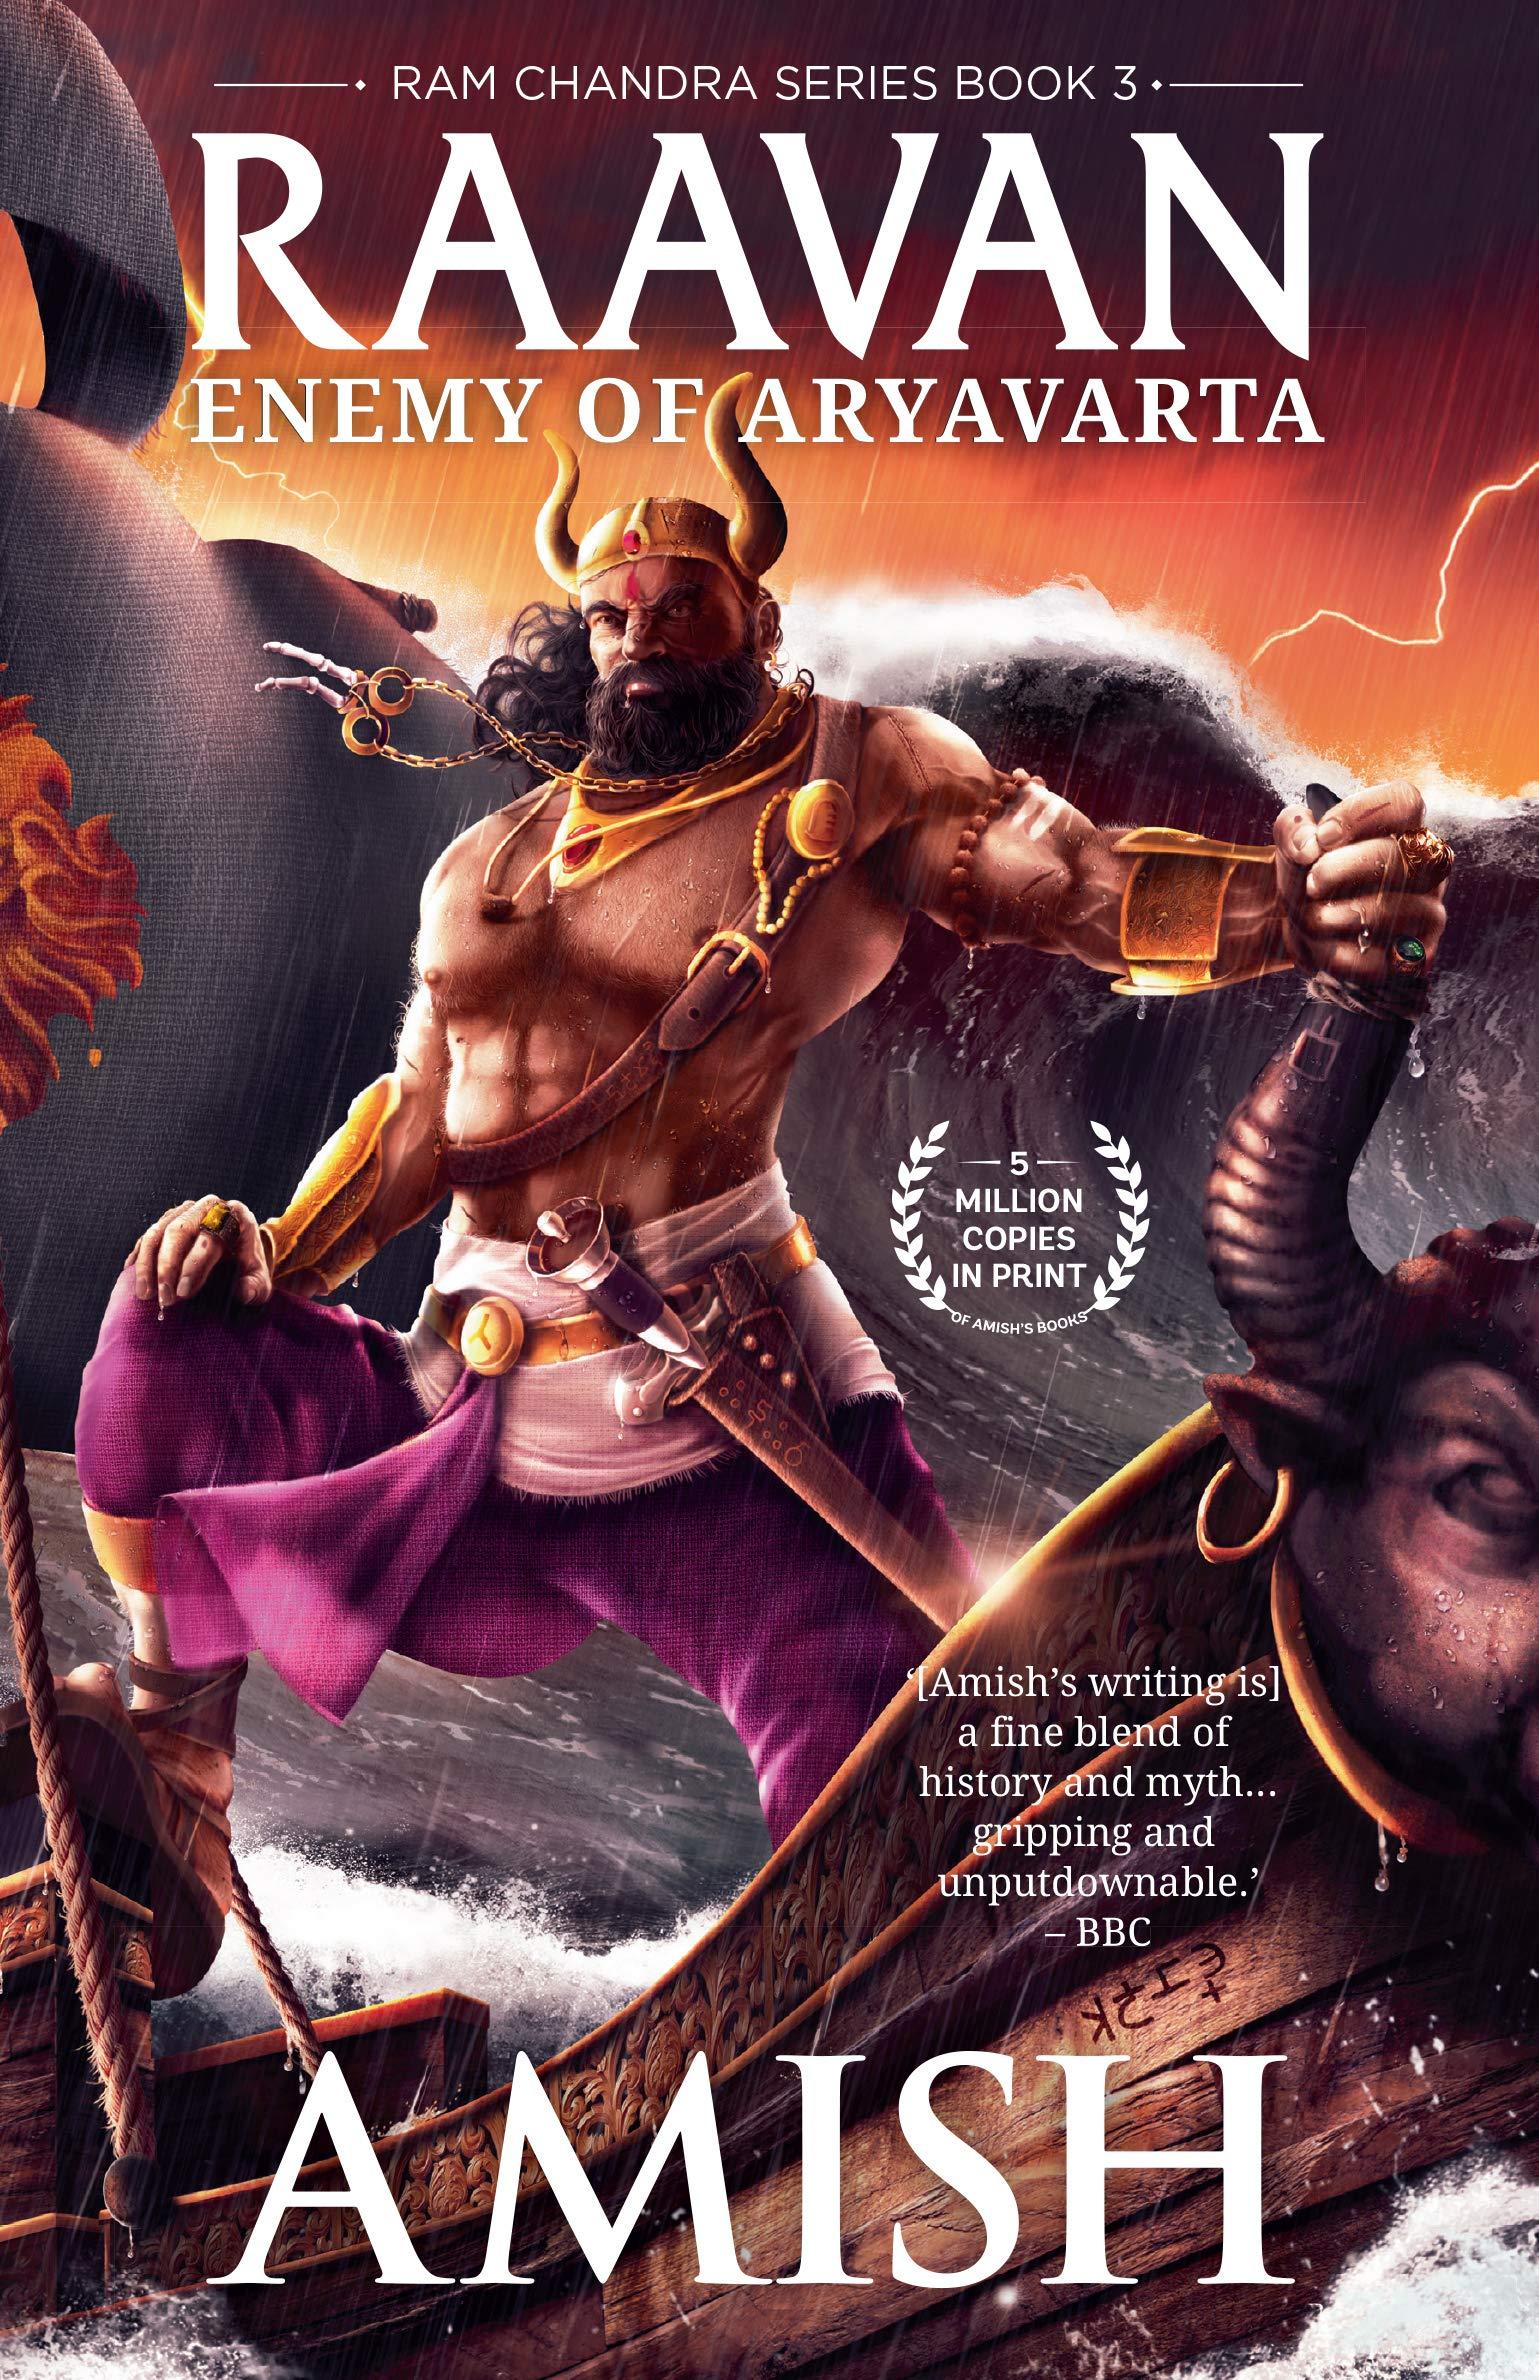 Raavan: Enemy of Aryavarta (Ram Chandra Series - Book 3) (9388754085) Amazon Price History, Amazon Price Tracker